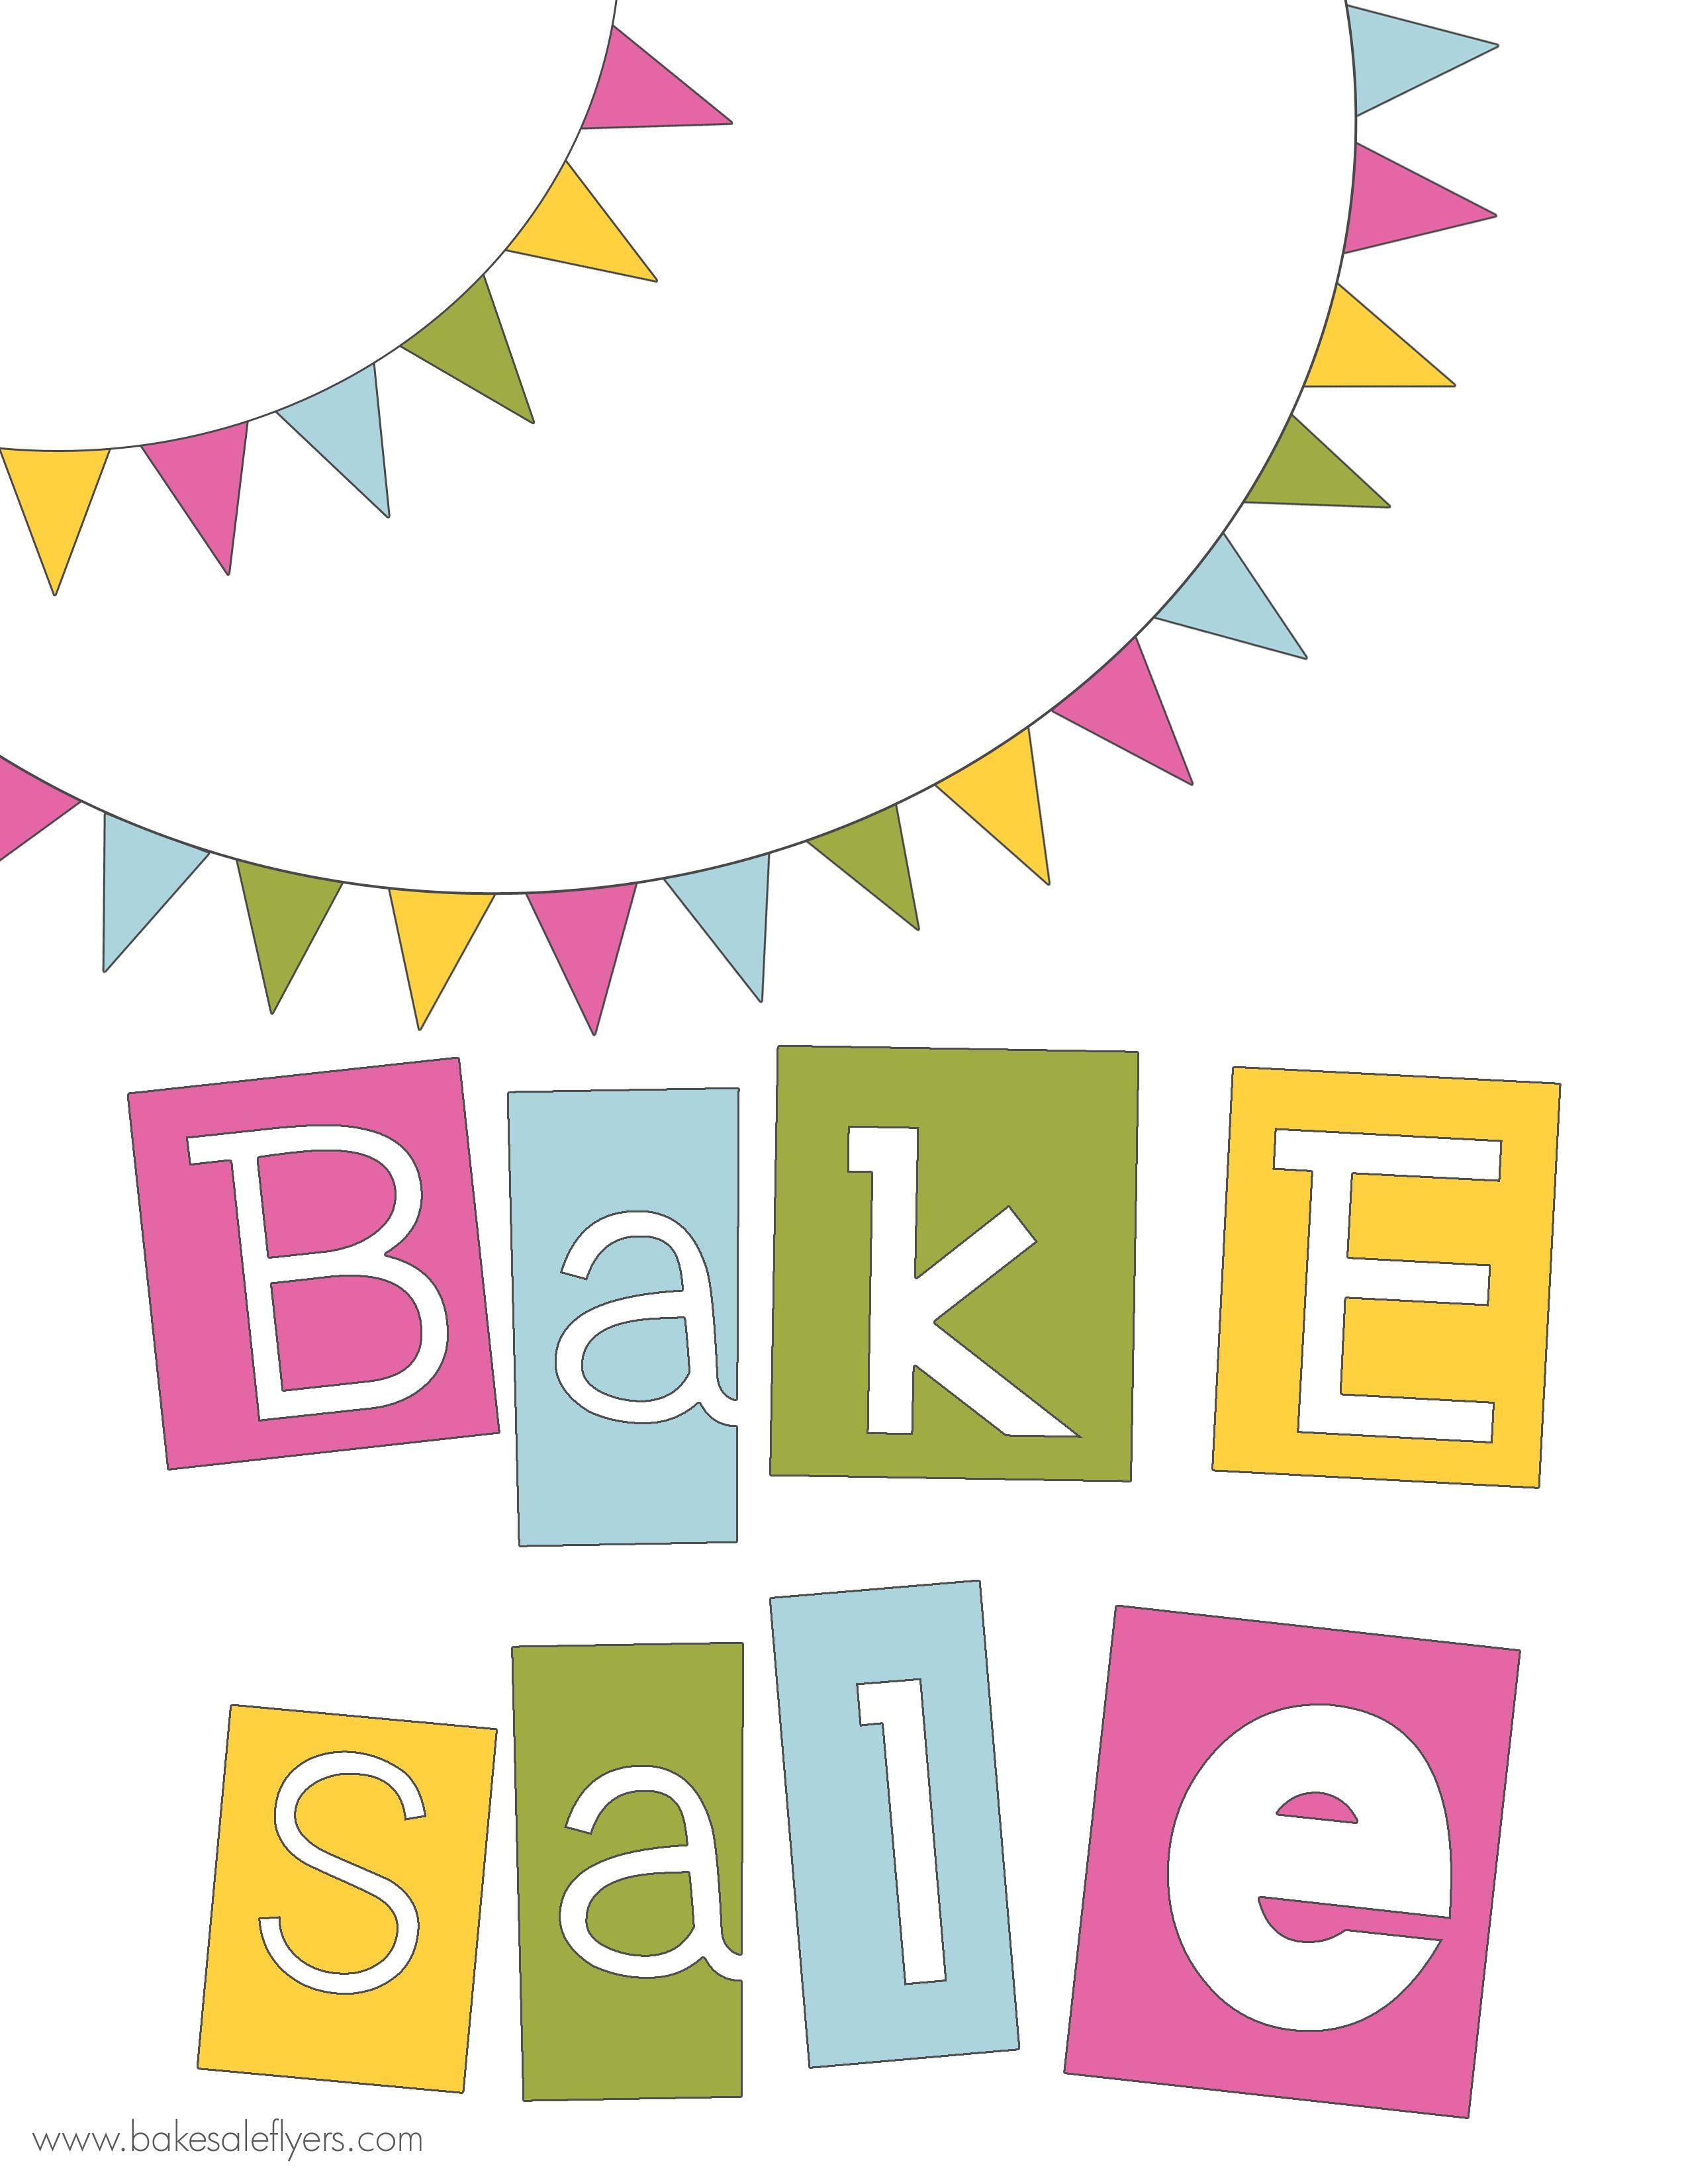 Free Printable Bake Sale Banner | Bake Sale Ideas | Pinterest | Bake - Free Printable Flyers